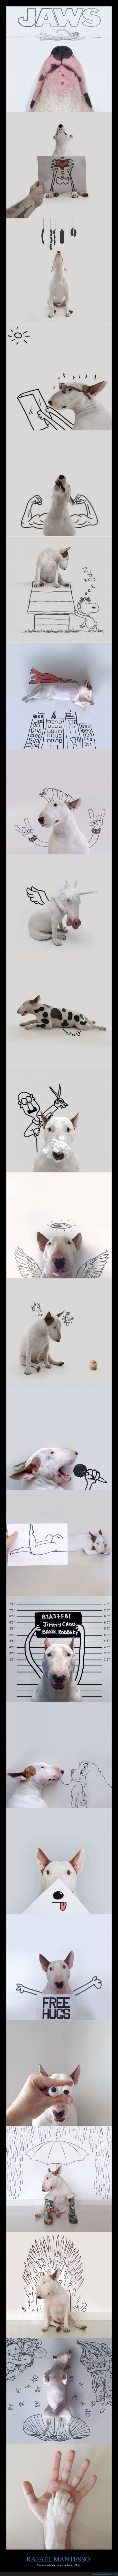 aburrimiento,arte,fotografo,Jimmy Choo,mascota,montaje,perro,pitbull,Rafael Mantesso,tiburon